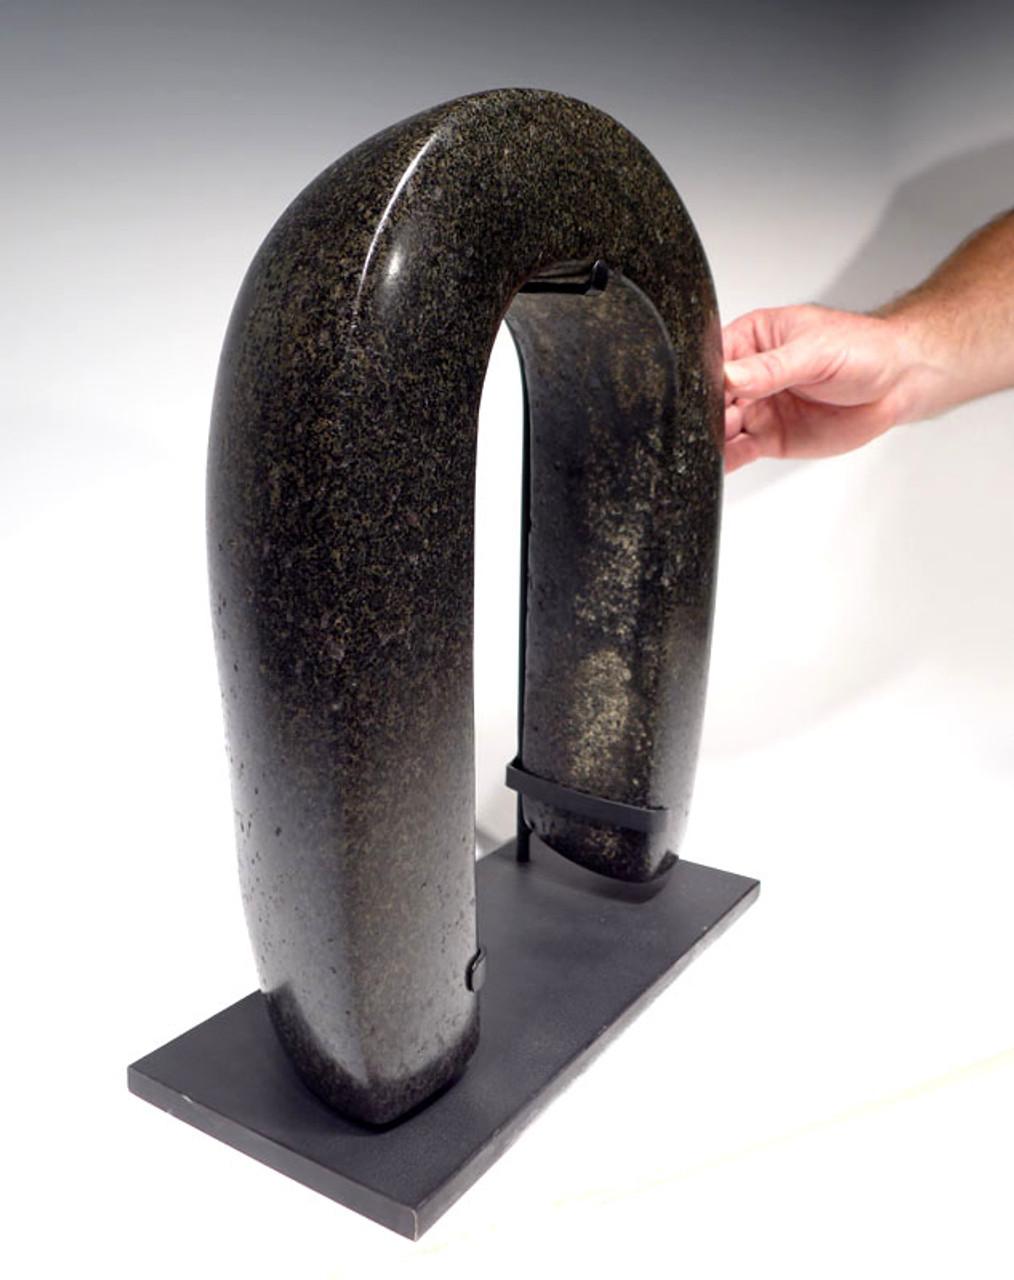 PC088 -  MUSEUM SPECIMEN MASSIVE PRE-COLUMBIAN RITUAL STONE BALLGAME CEREMONIAL YOKE INTACT FROM MESOAMERICA